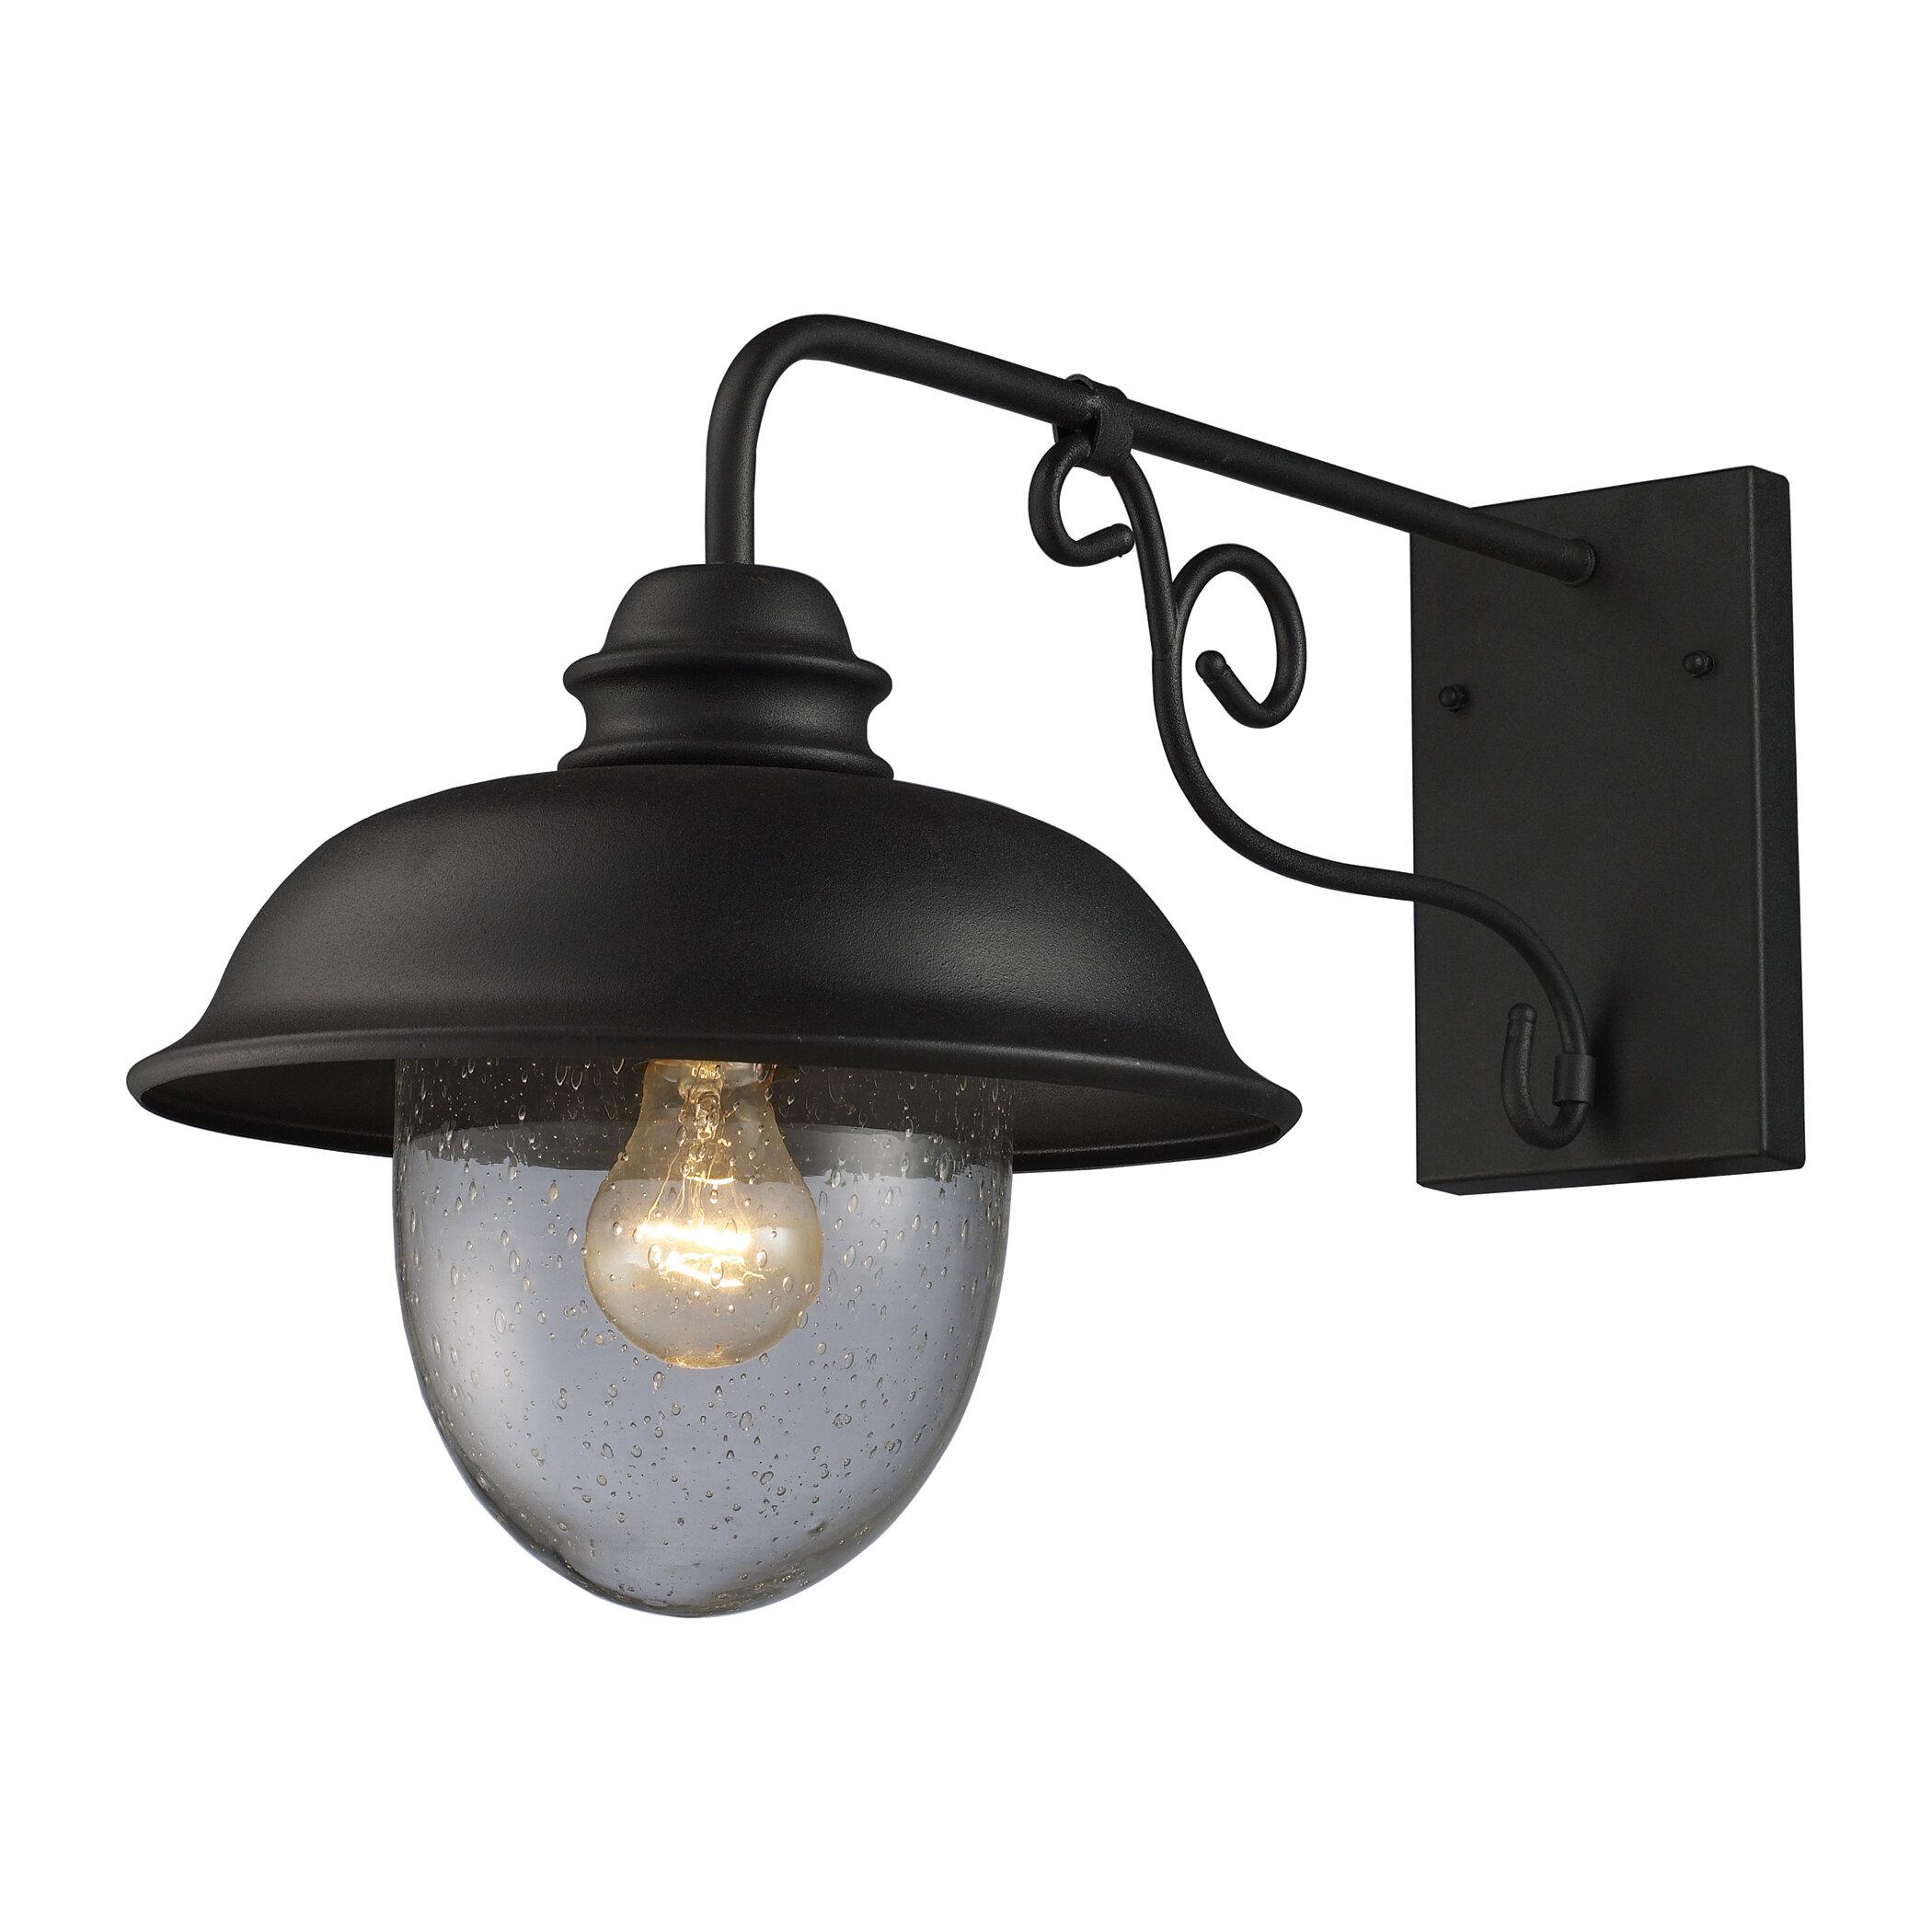 gracie oaks ying rustic 1 light outdoor barn light reviews wayfair